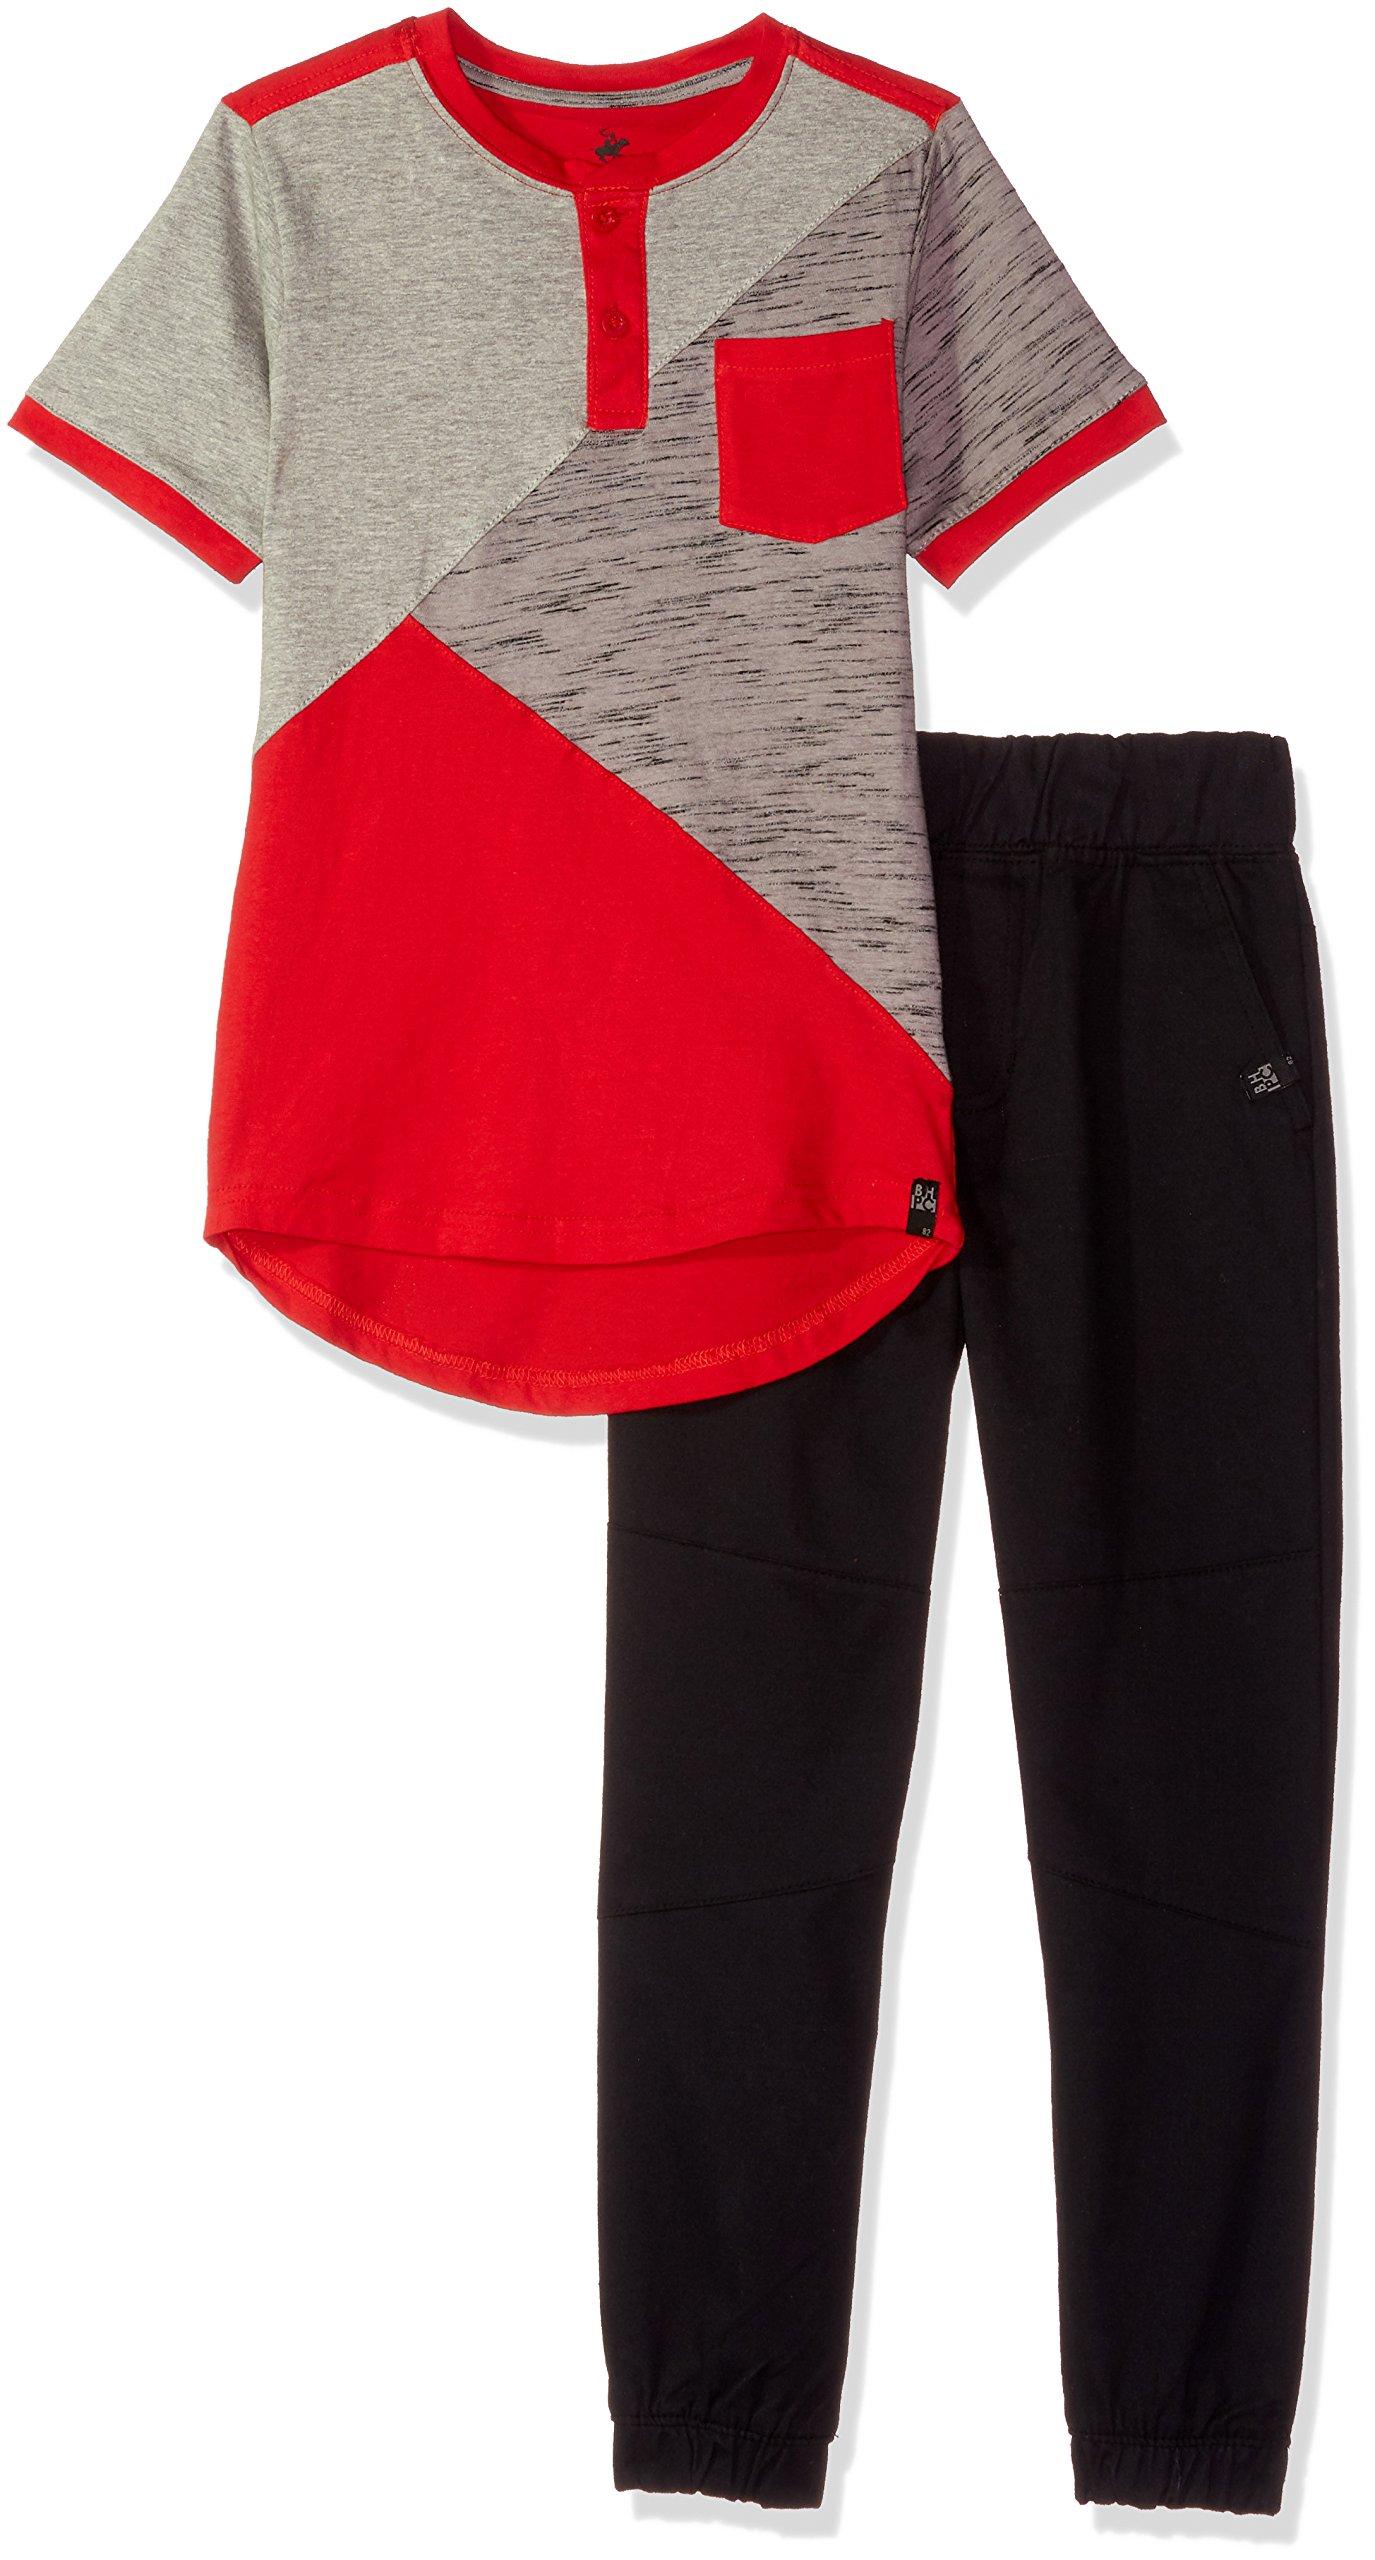 Beverly Hills Polo Club Boys' Big Short Sleeve Top